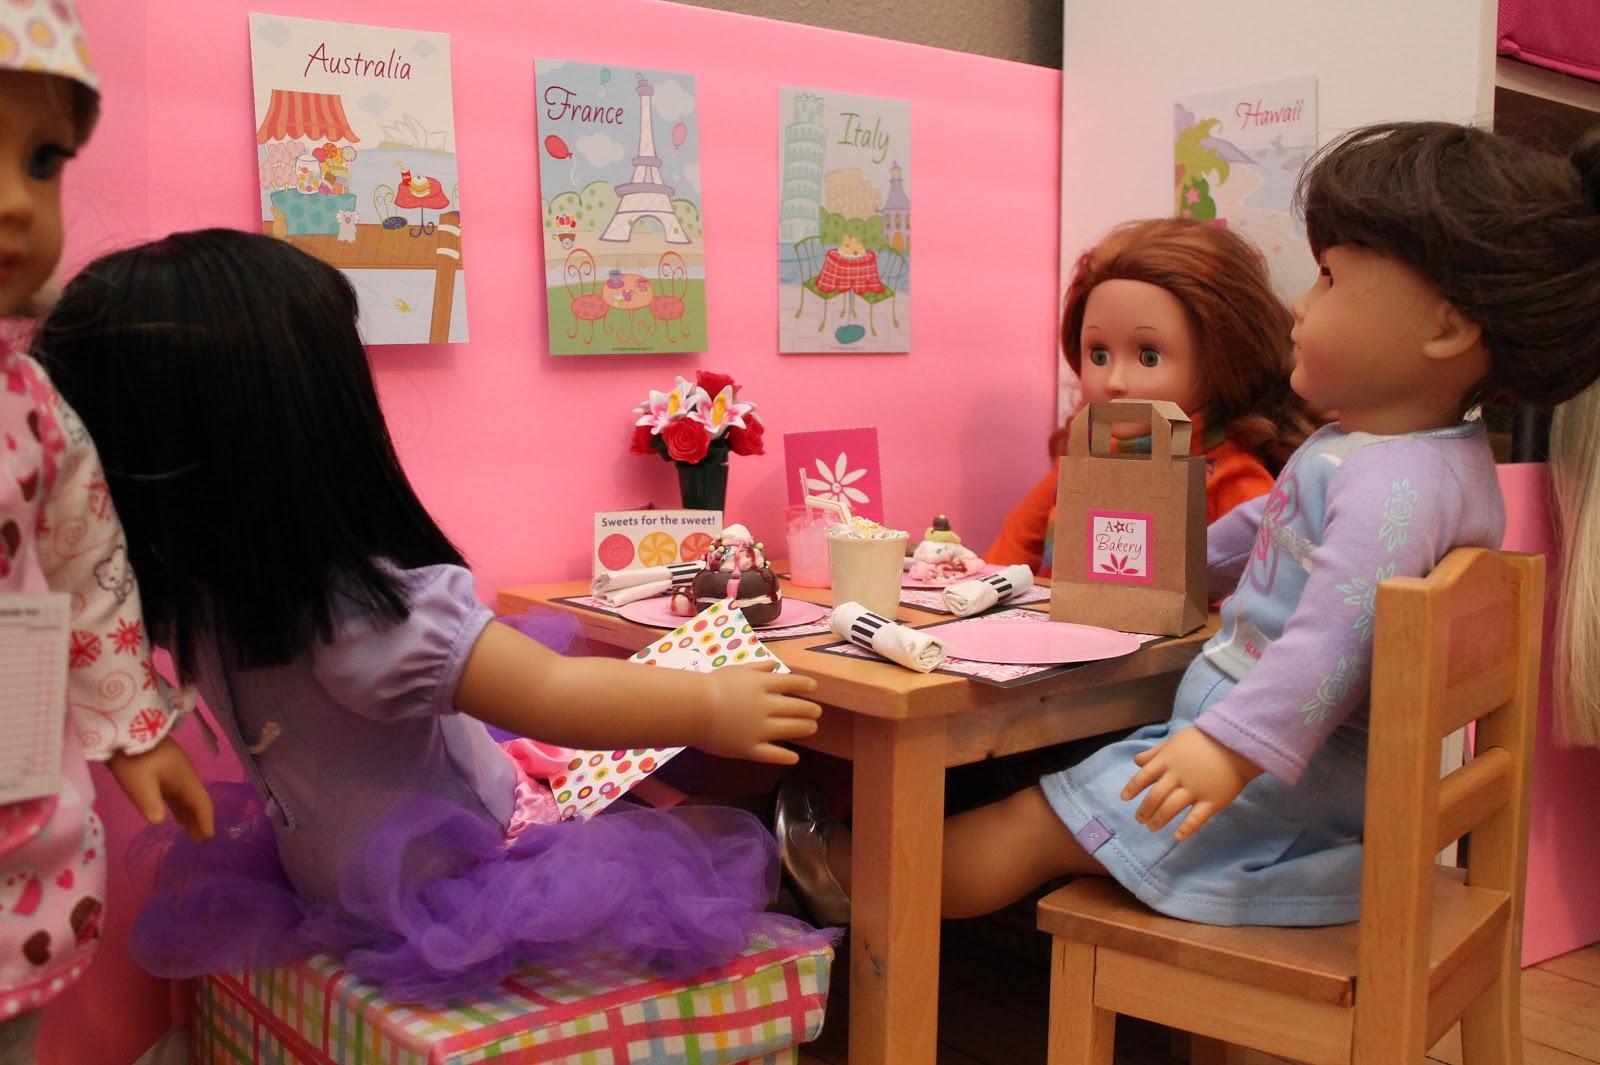 Awe Inspiring American Girl Doll Play Creating An American Girl Doll Diner Machost Co Dining Chair Design Ideas Machostcouk